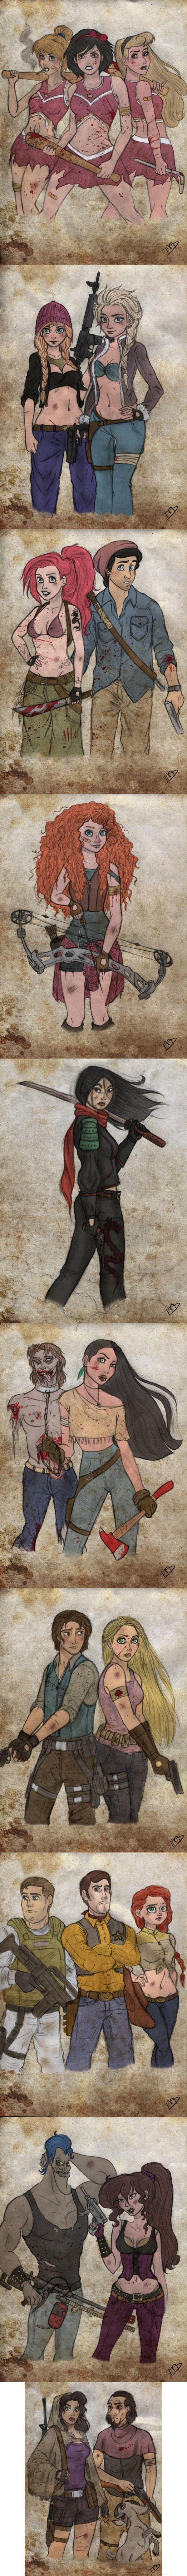 Disney zombie killers